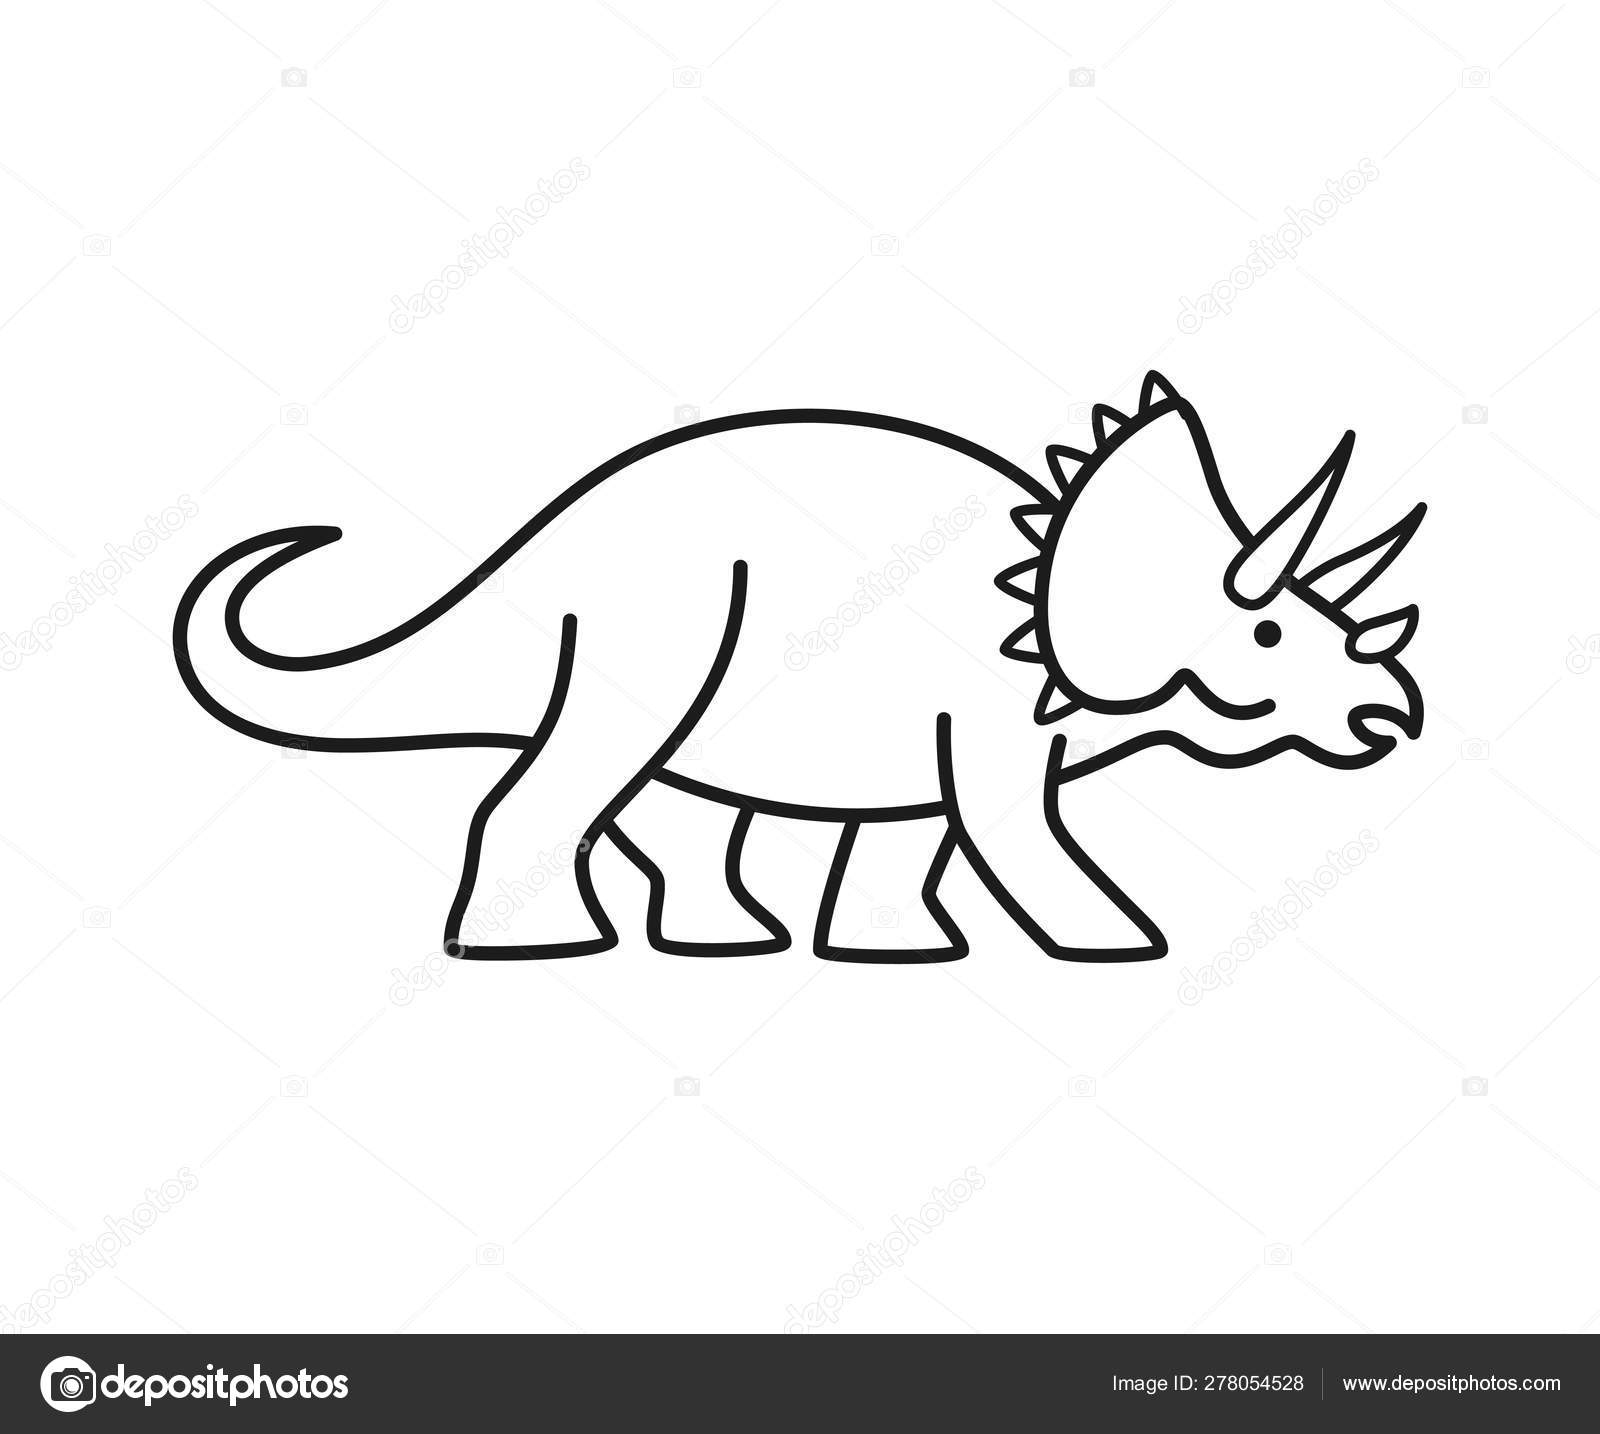 Download tyrannosaurus triceratops ankylosaurus dinosaur - cartoon dinosaurs  png - Free PNG Images | TOPpng